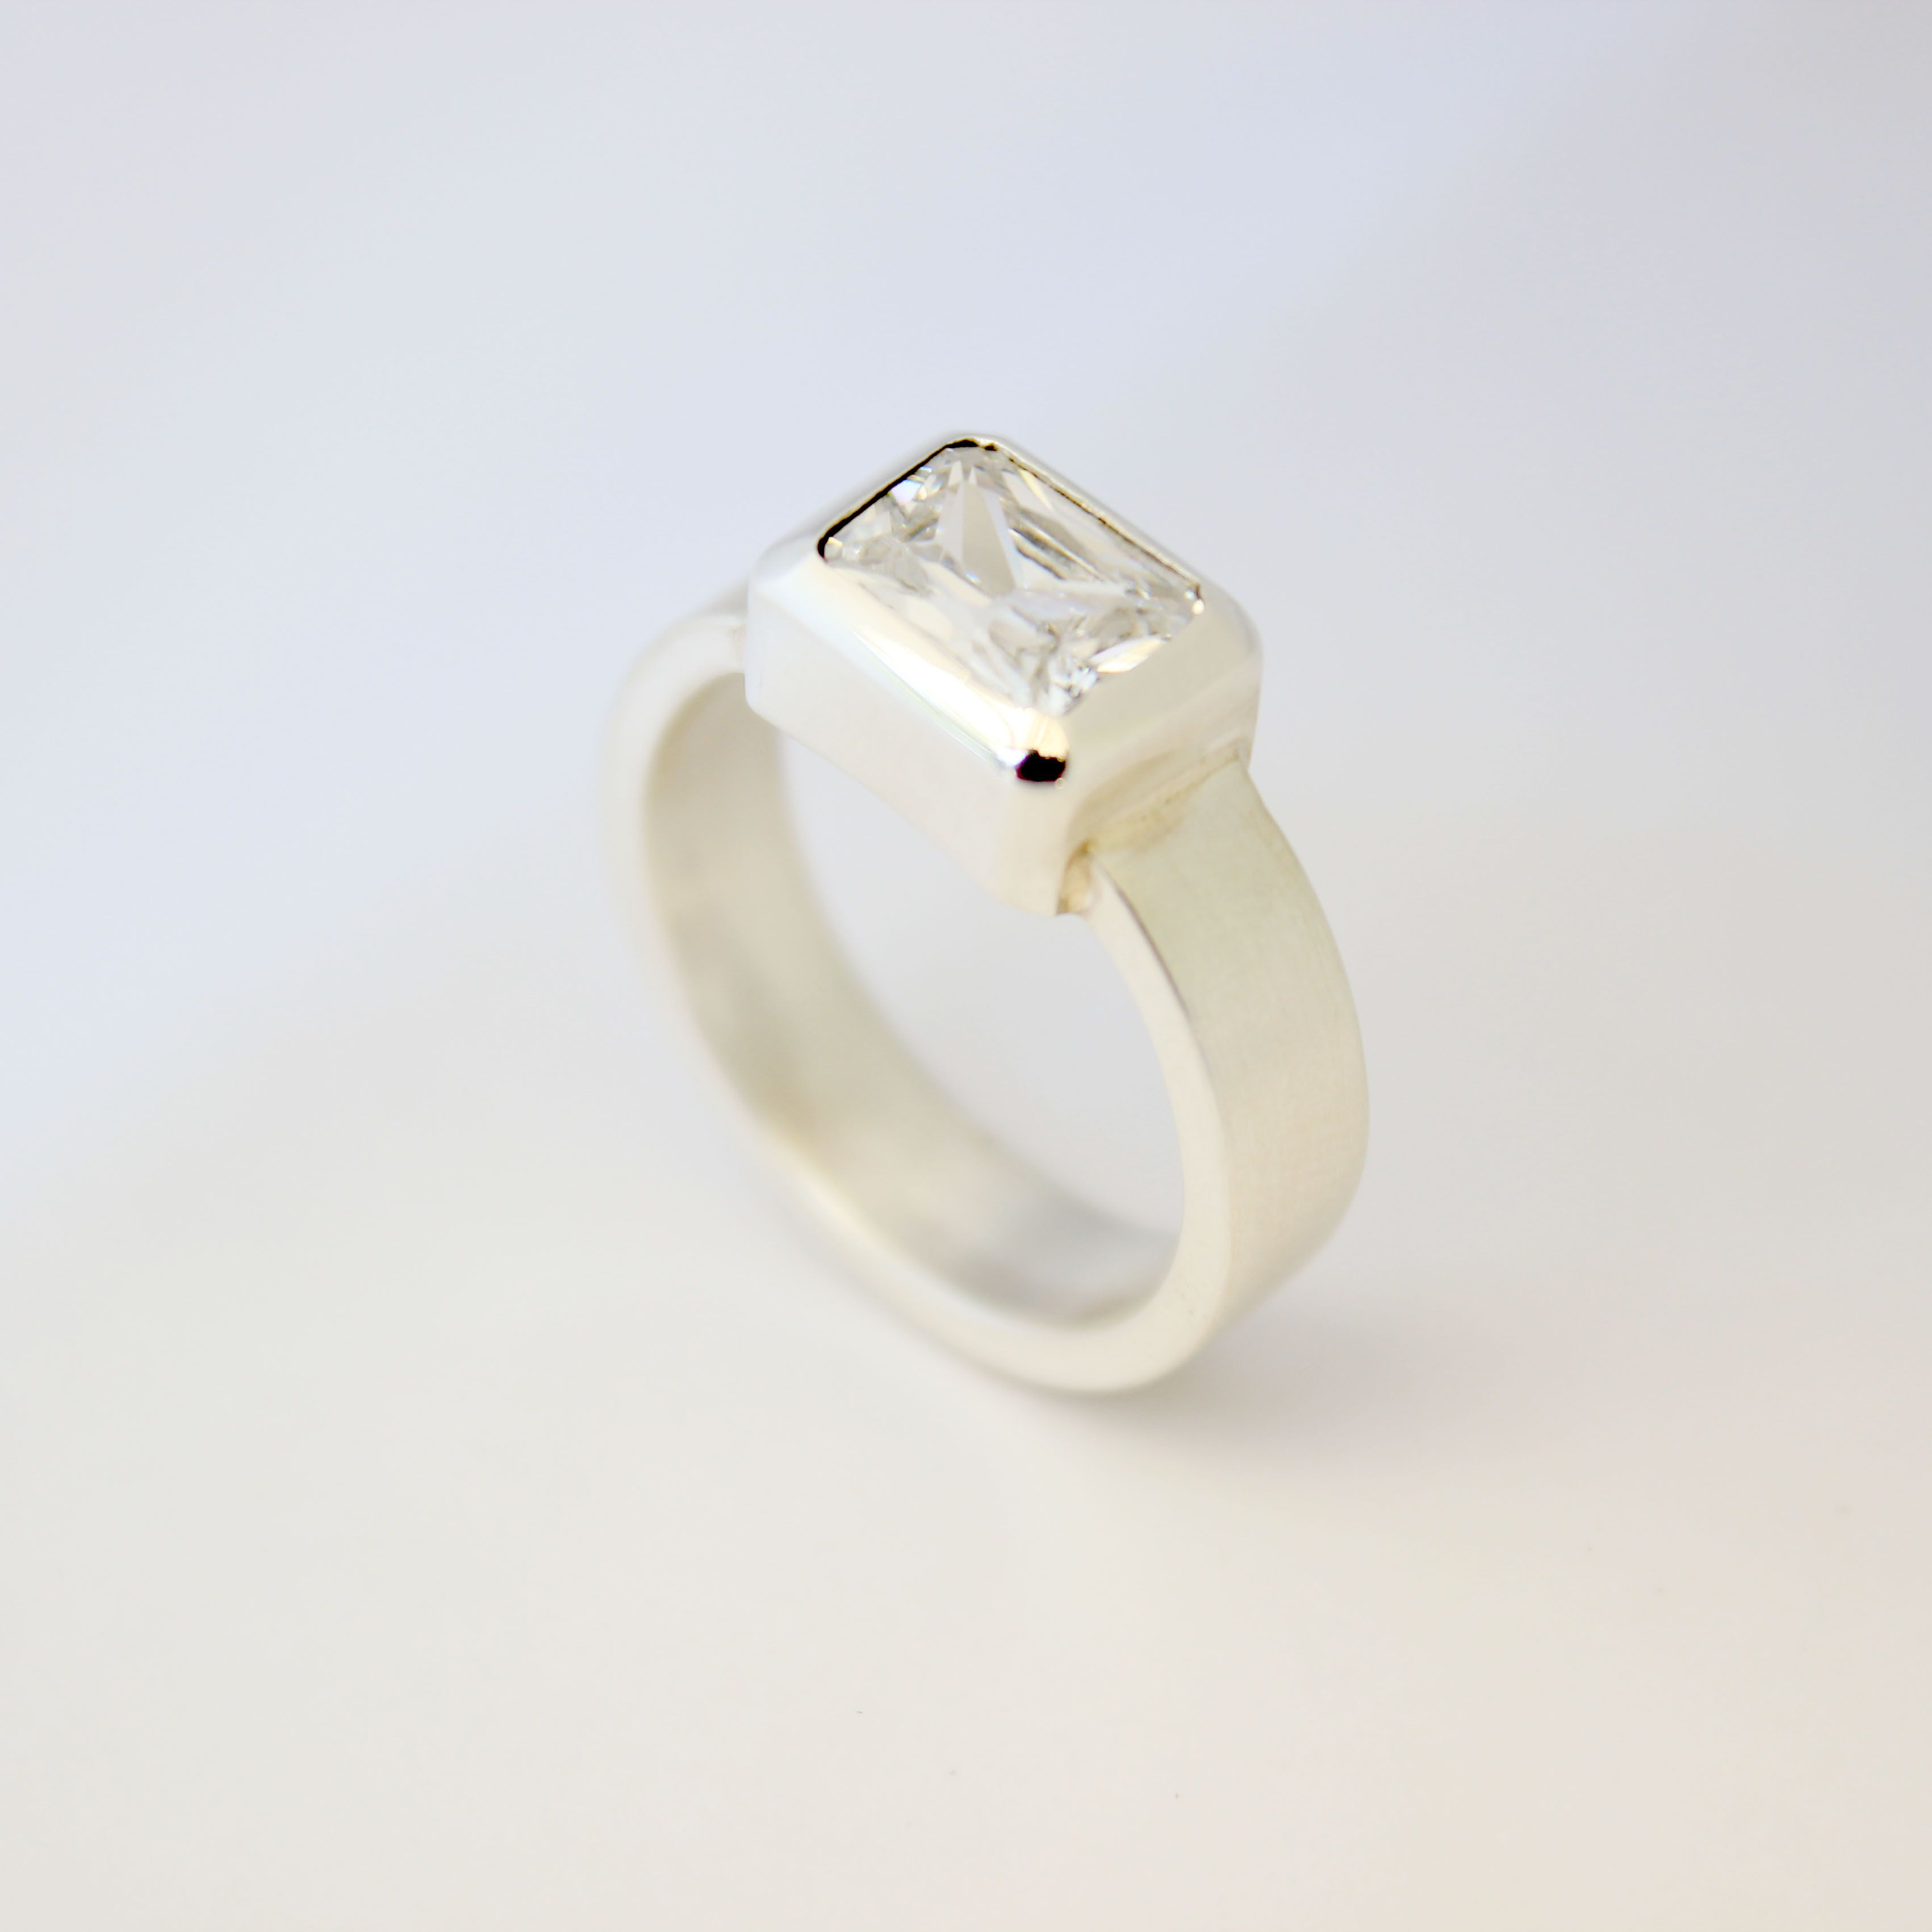 Solitario corte Esmeralda Anillo de plata 950 con cristal Swarovski.